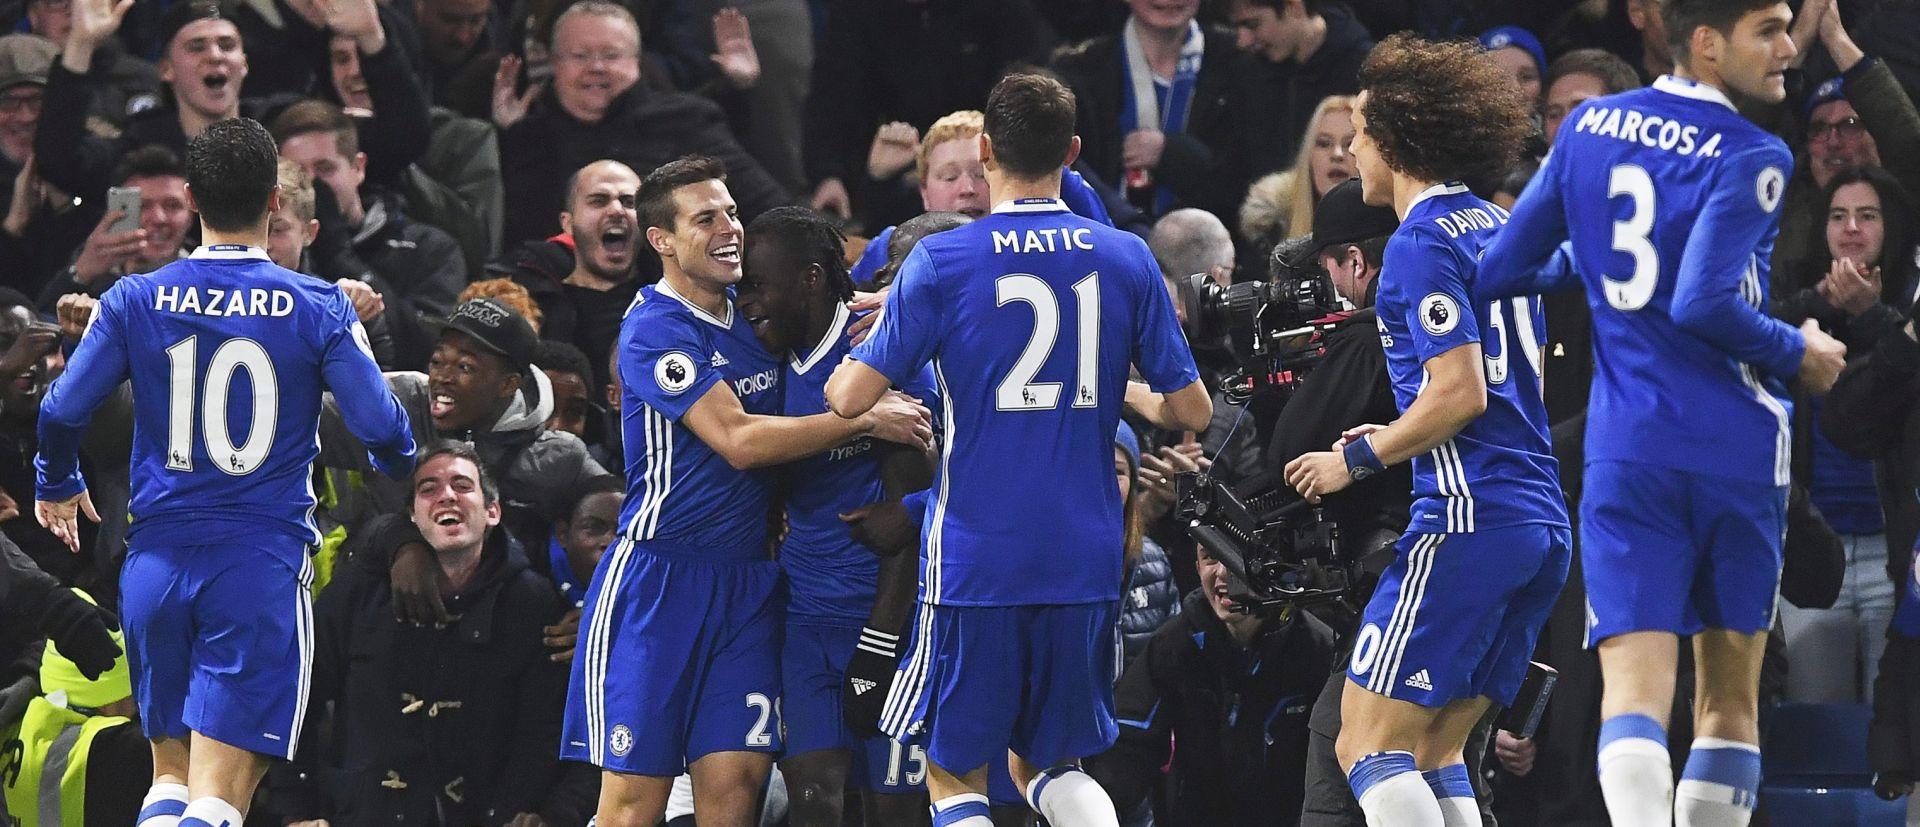 PREMIERLIGA Veliki preokret Chelsea, dva crvena za City